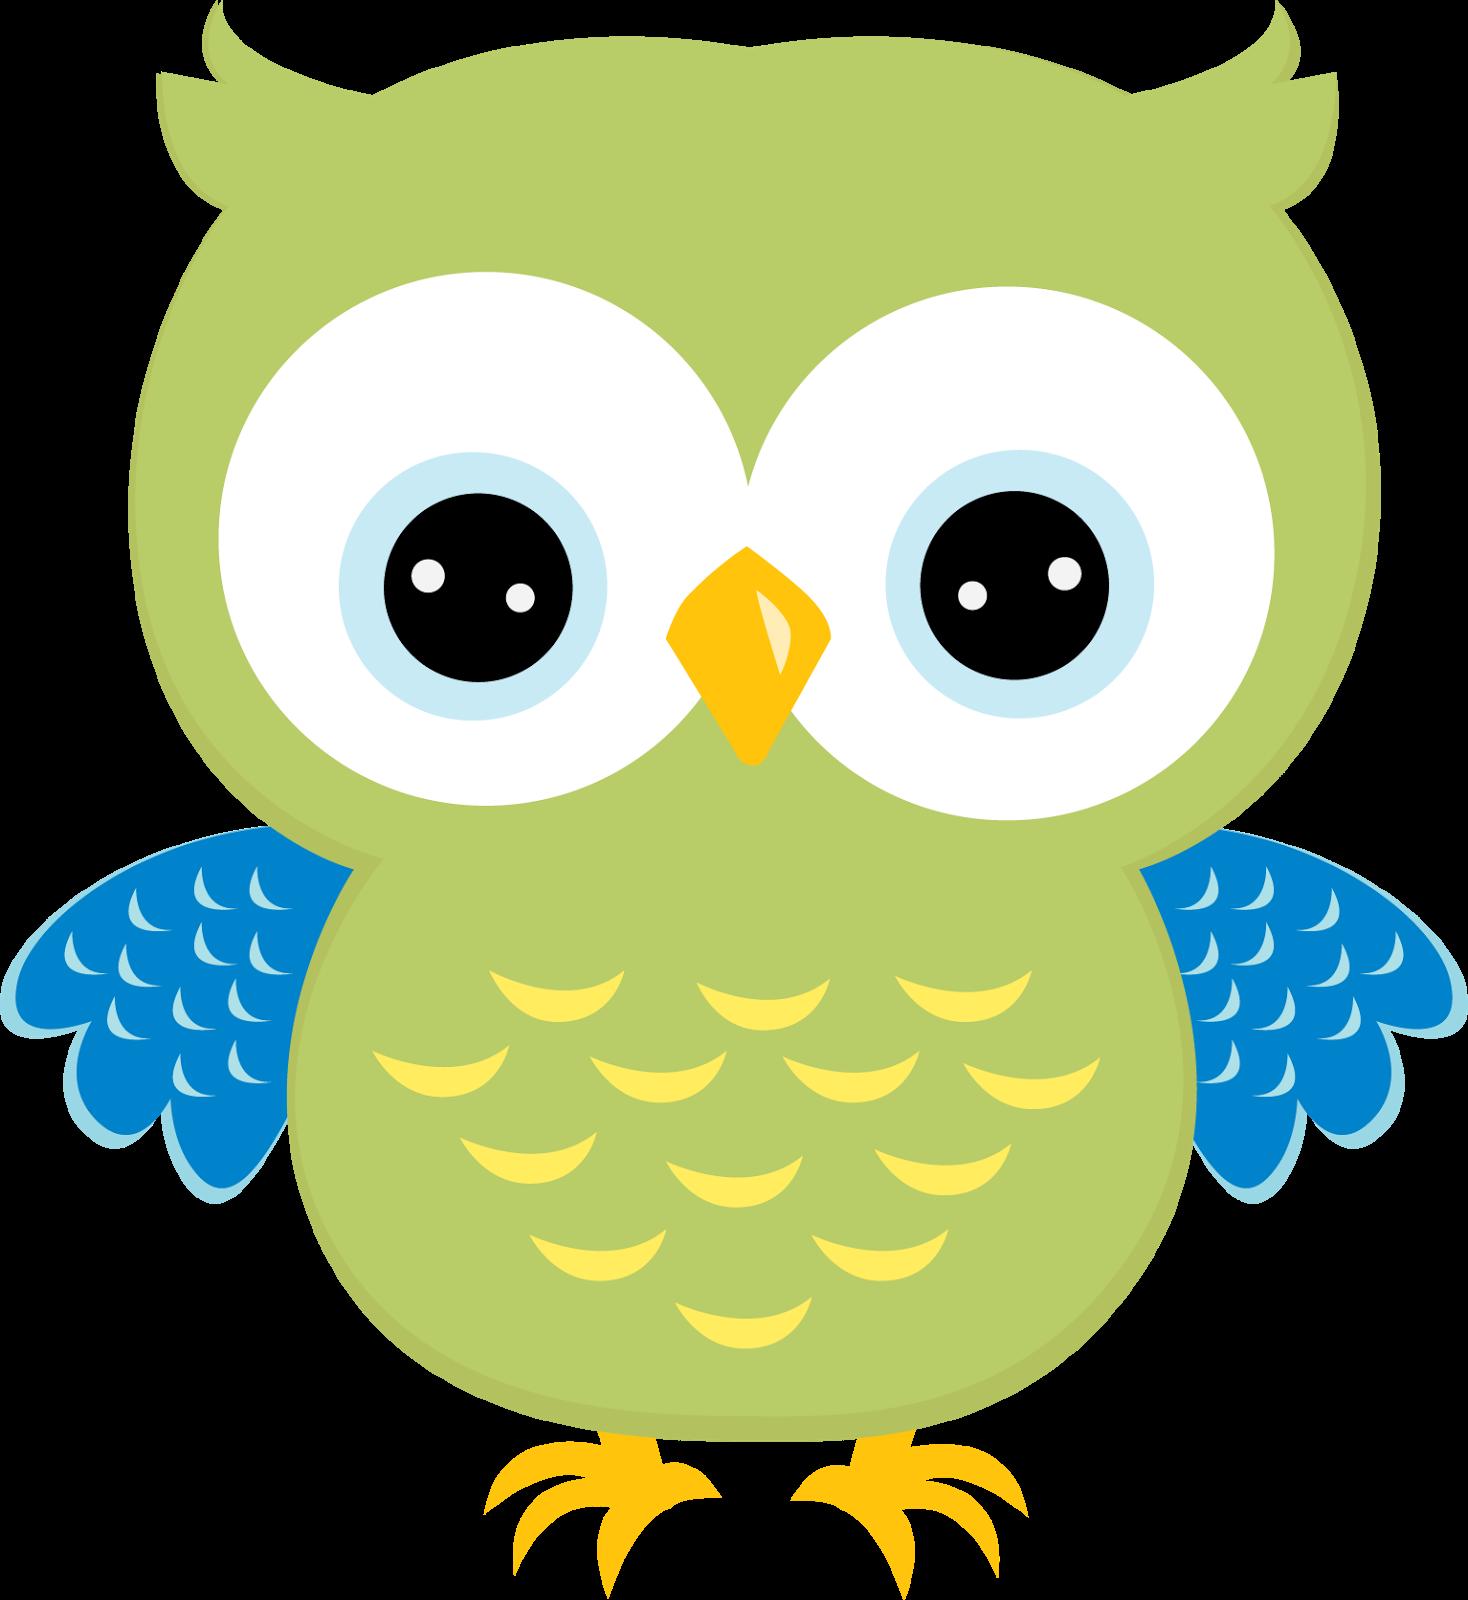 Clipart owl nurse, Clipart owl nurse Transparent FREE for.